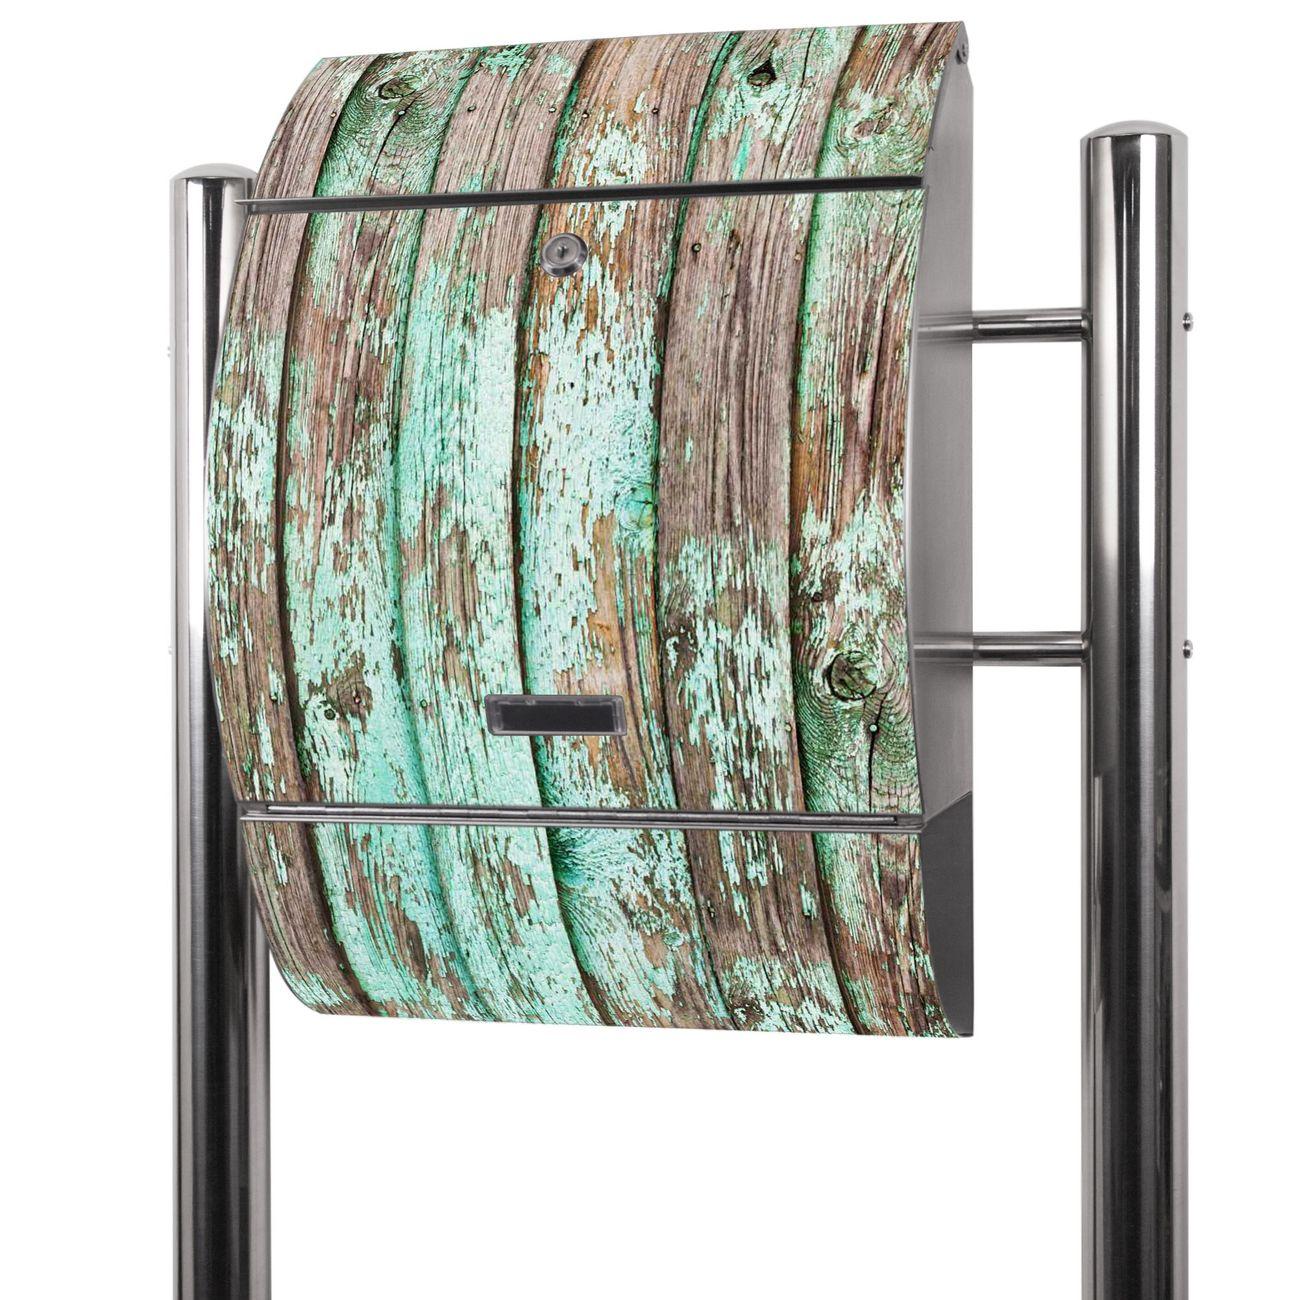 Edelstahl Standbriefkasten Verwittertes Holz